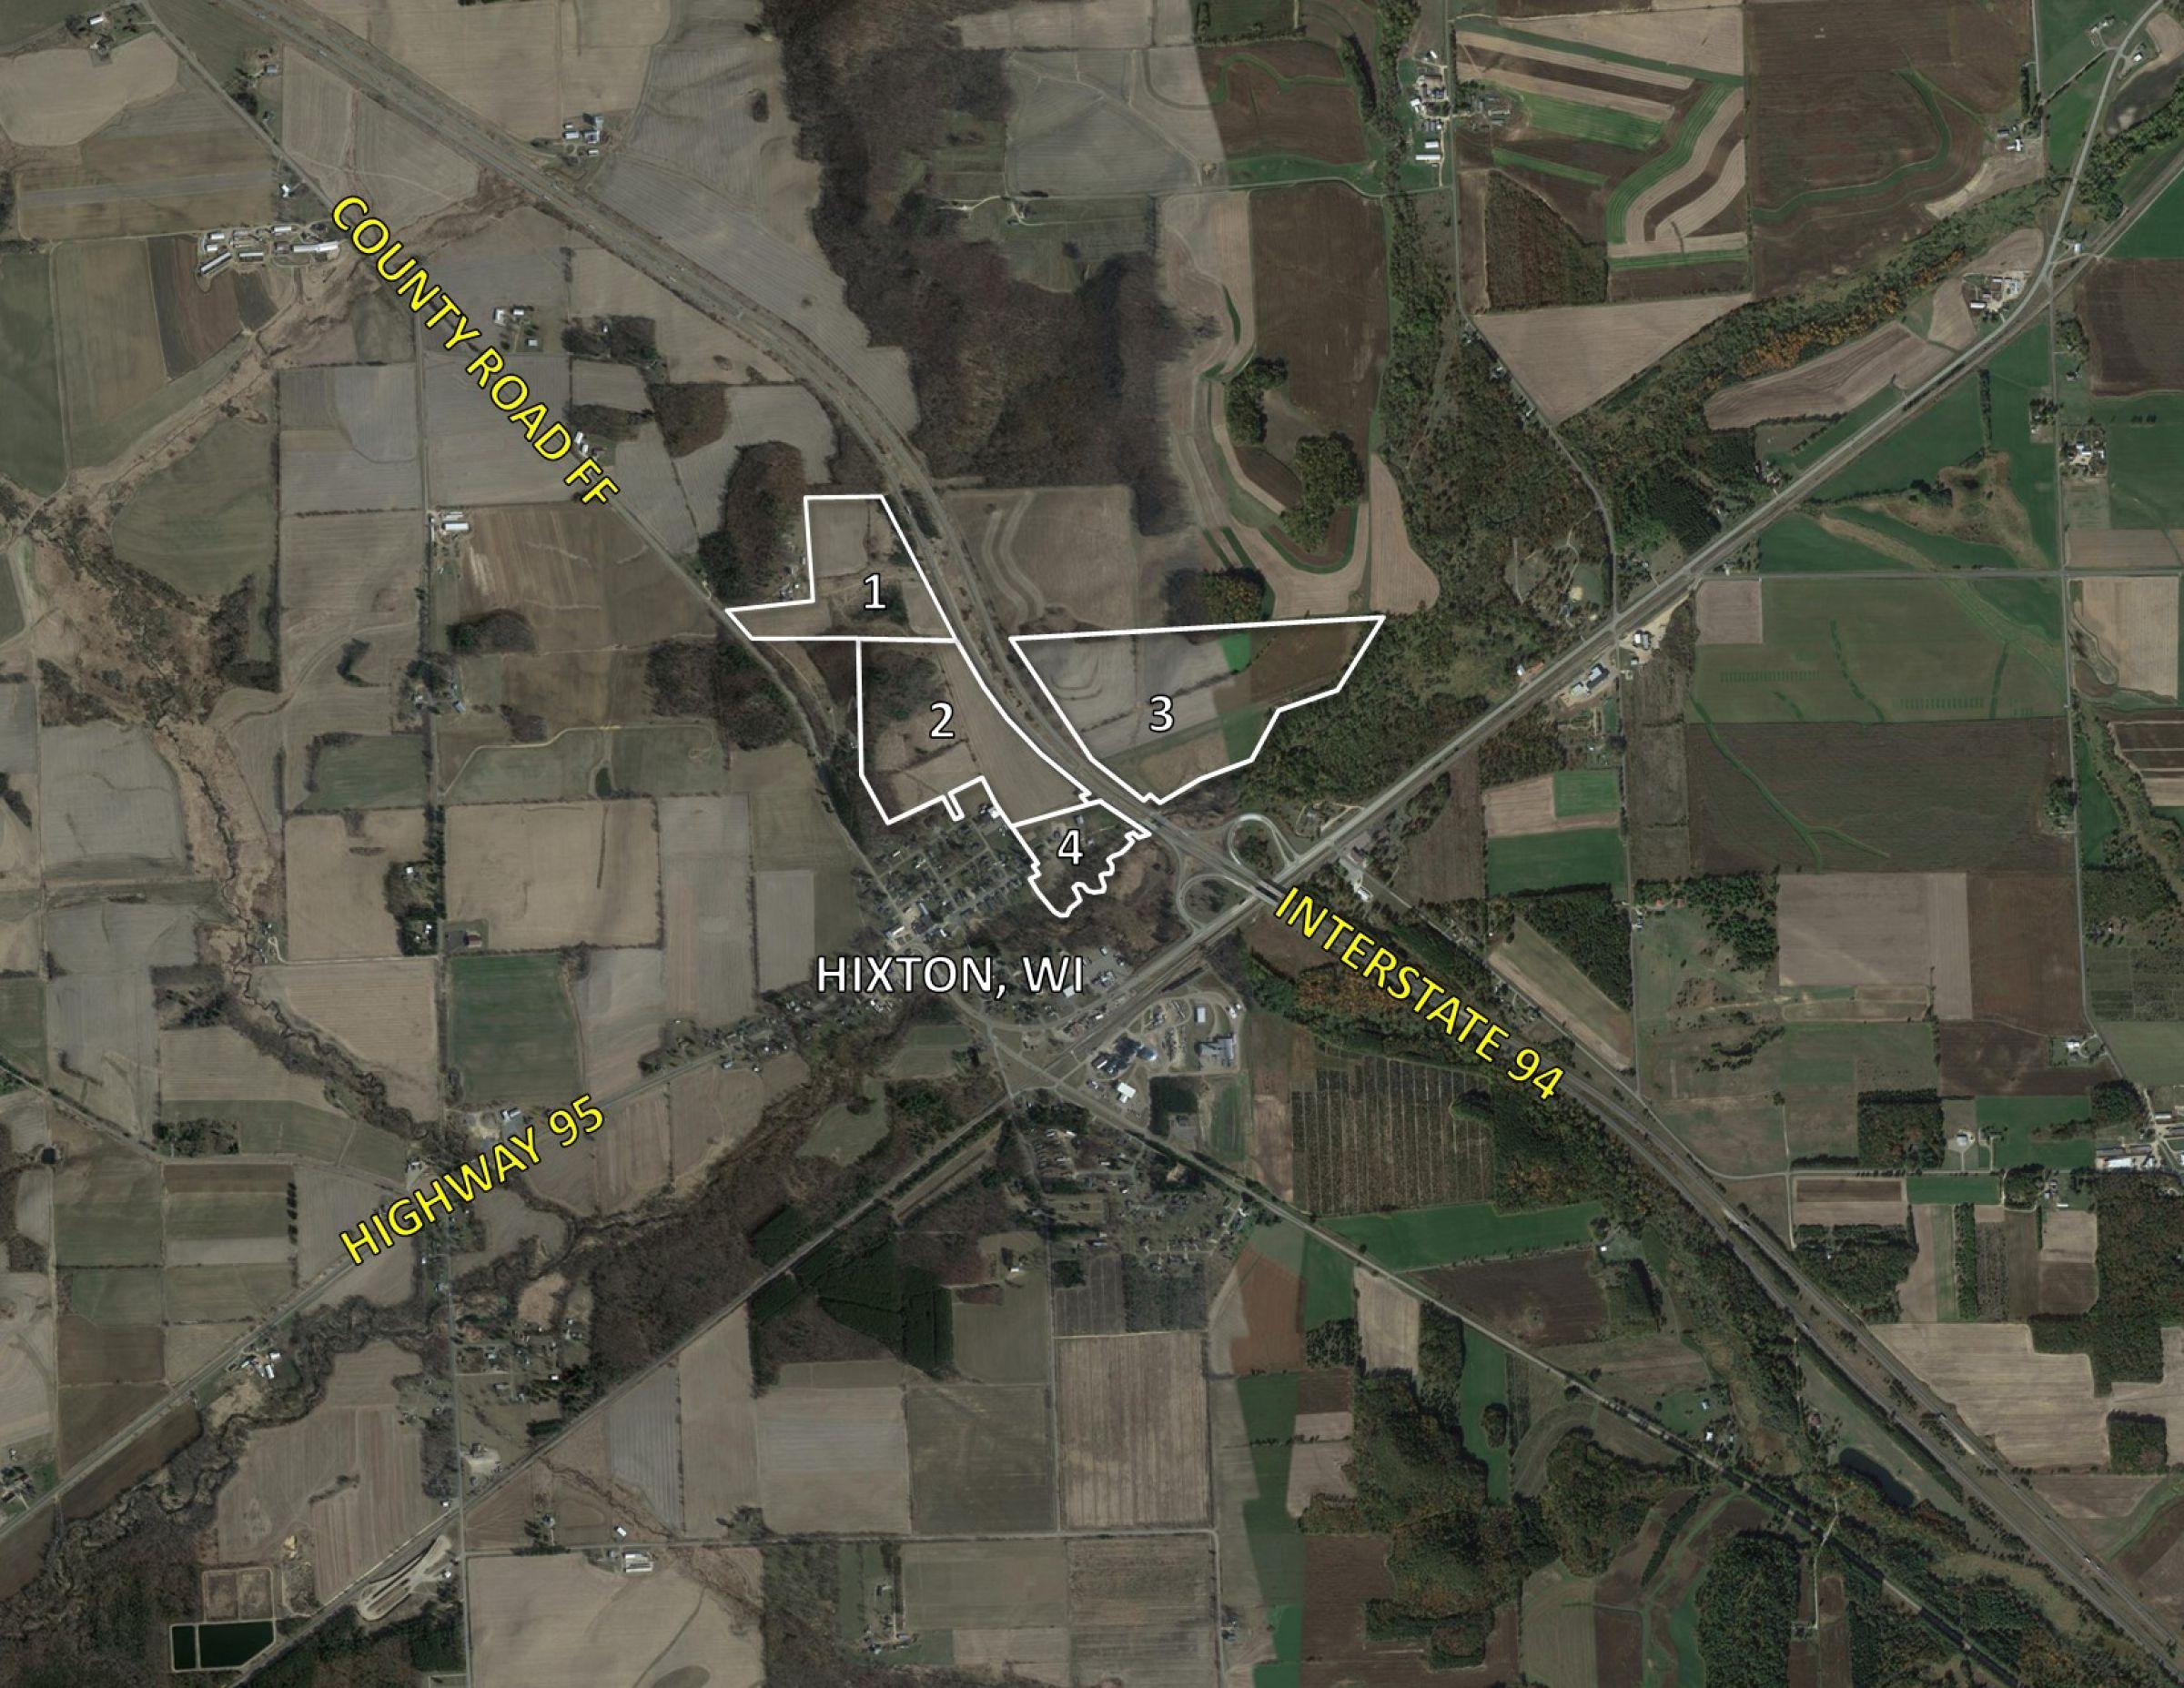 2-4449-acres-ml-3rd-street-hixton-54635-1-2021-09-18-204613.jpg